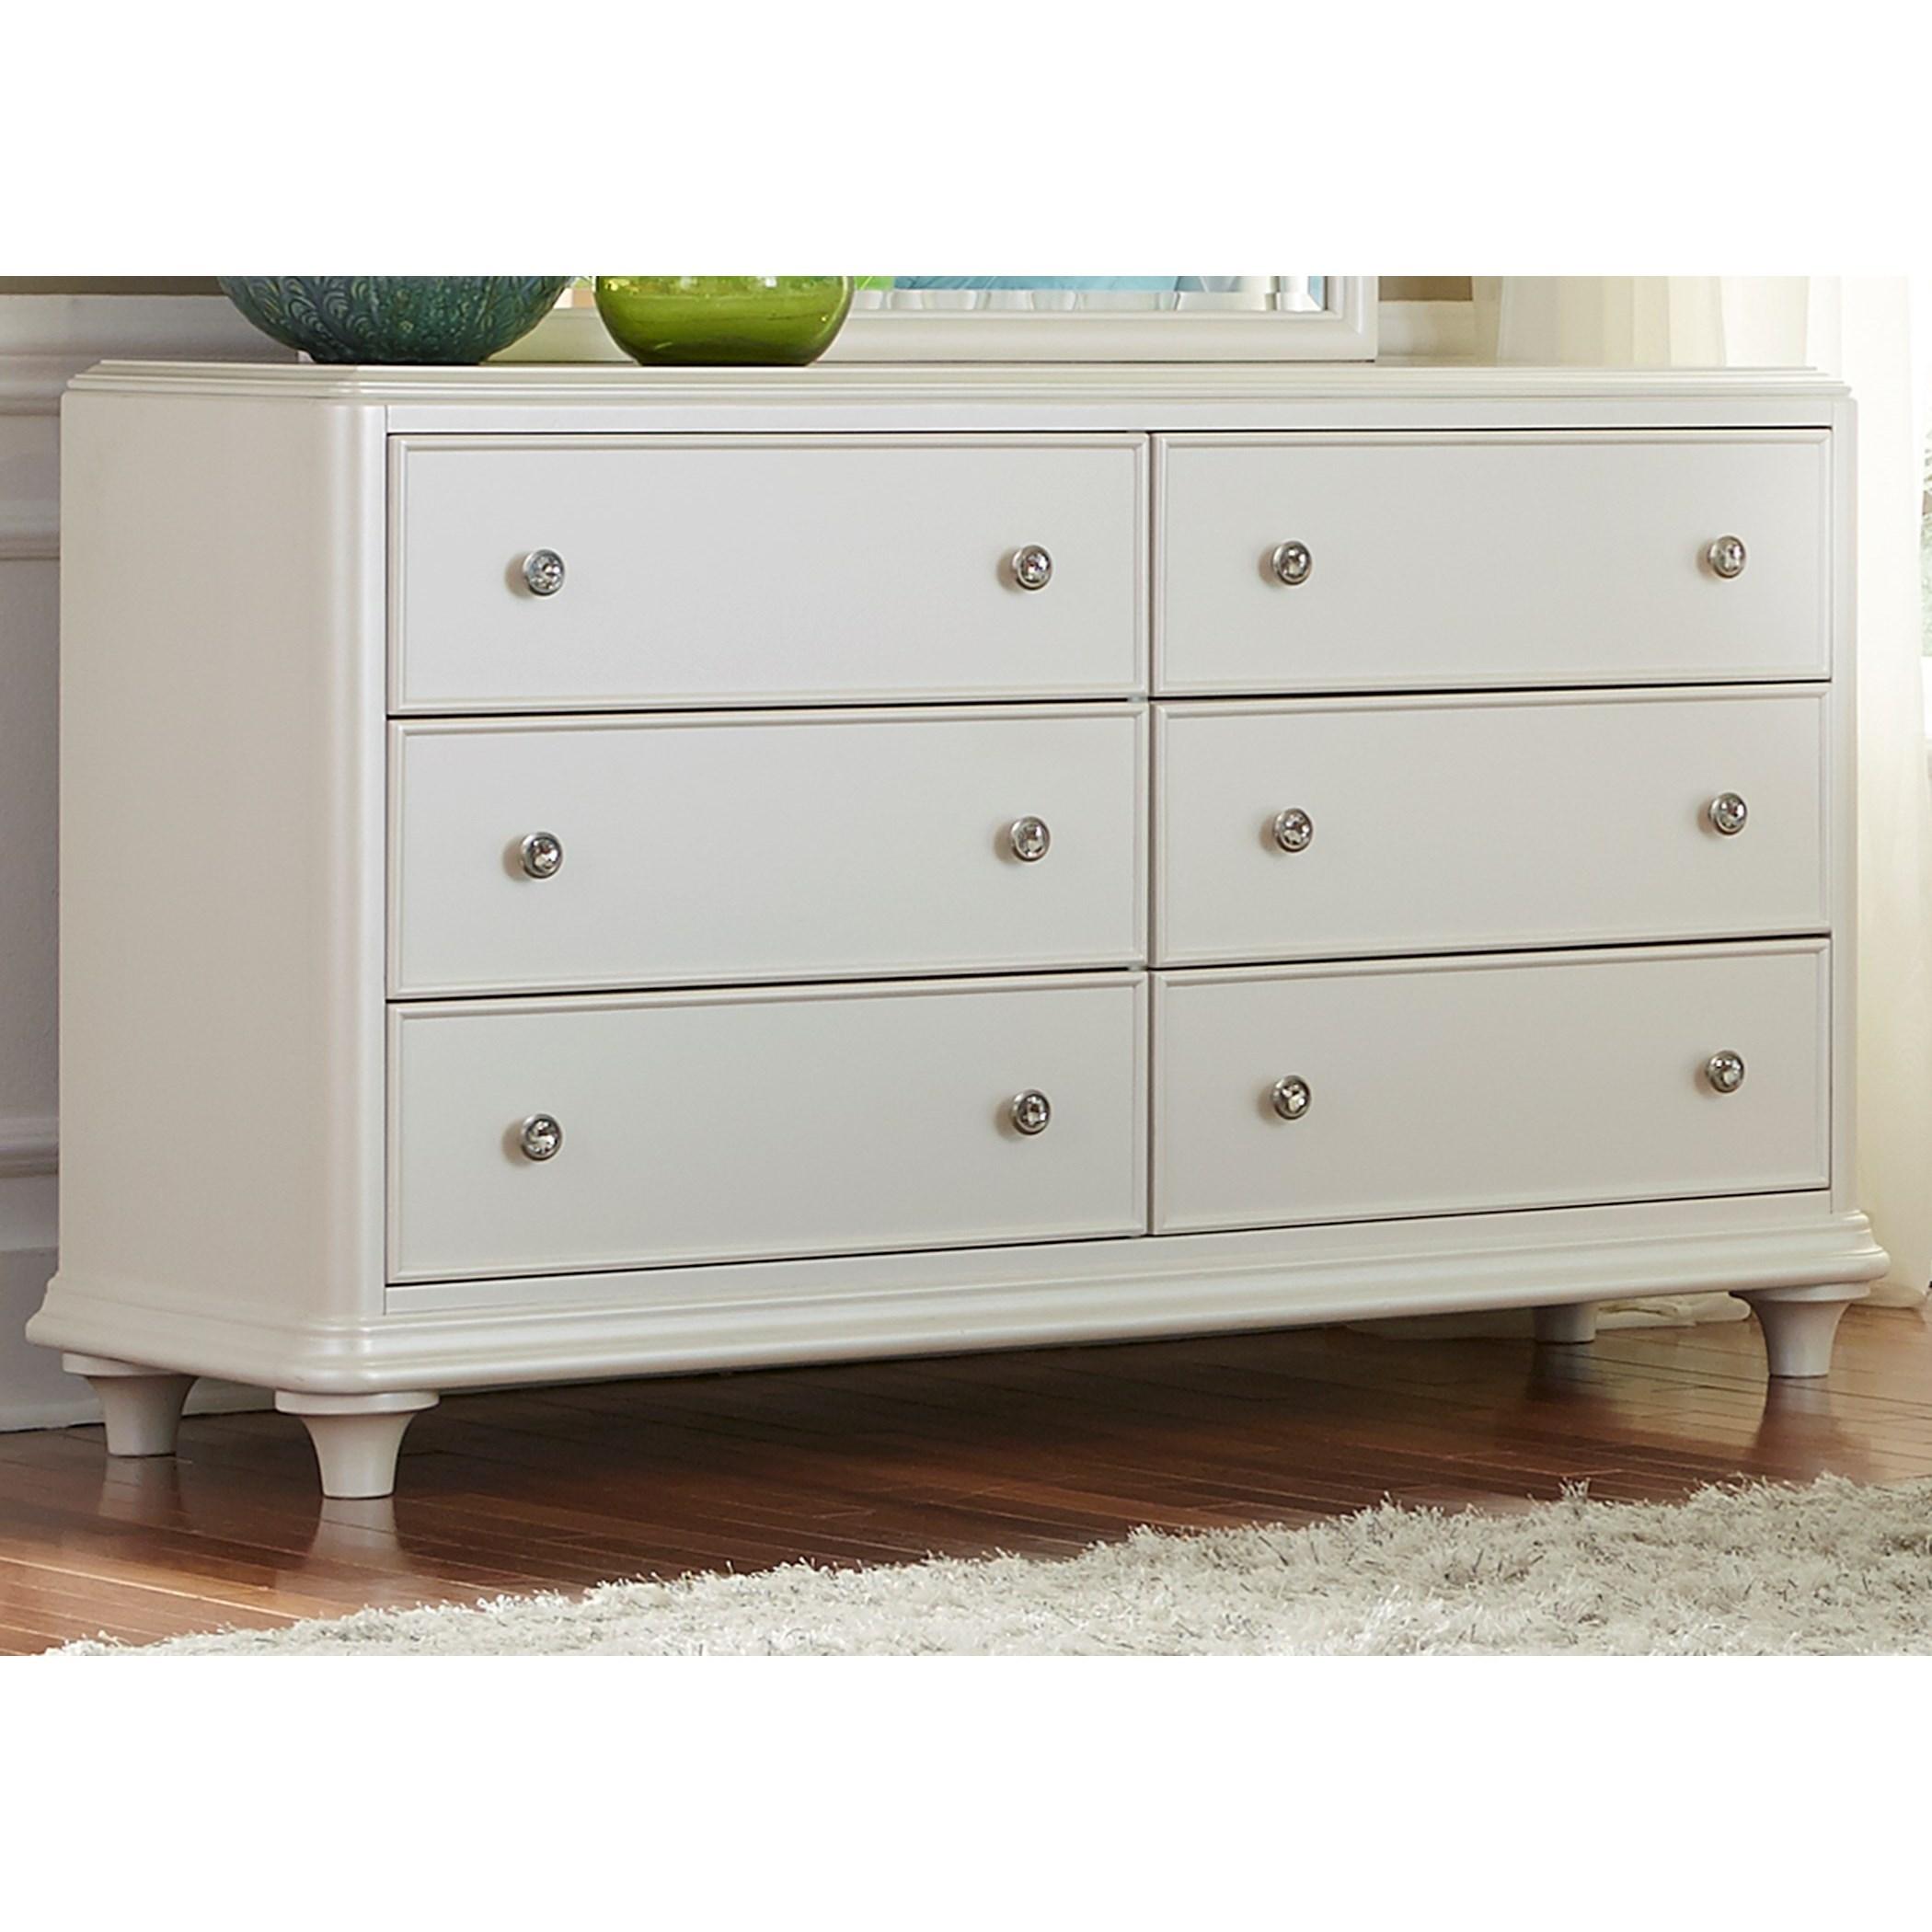 Vendor 5349 Stardust 710 Br30 Contemporary Glam 6 Drawer Dresser With Crystal Knobs Becker